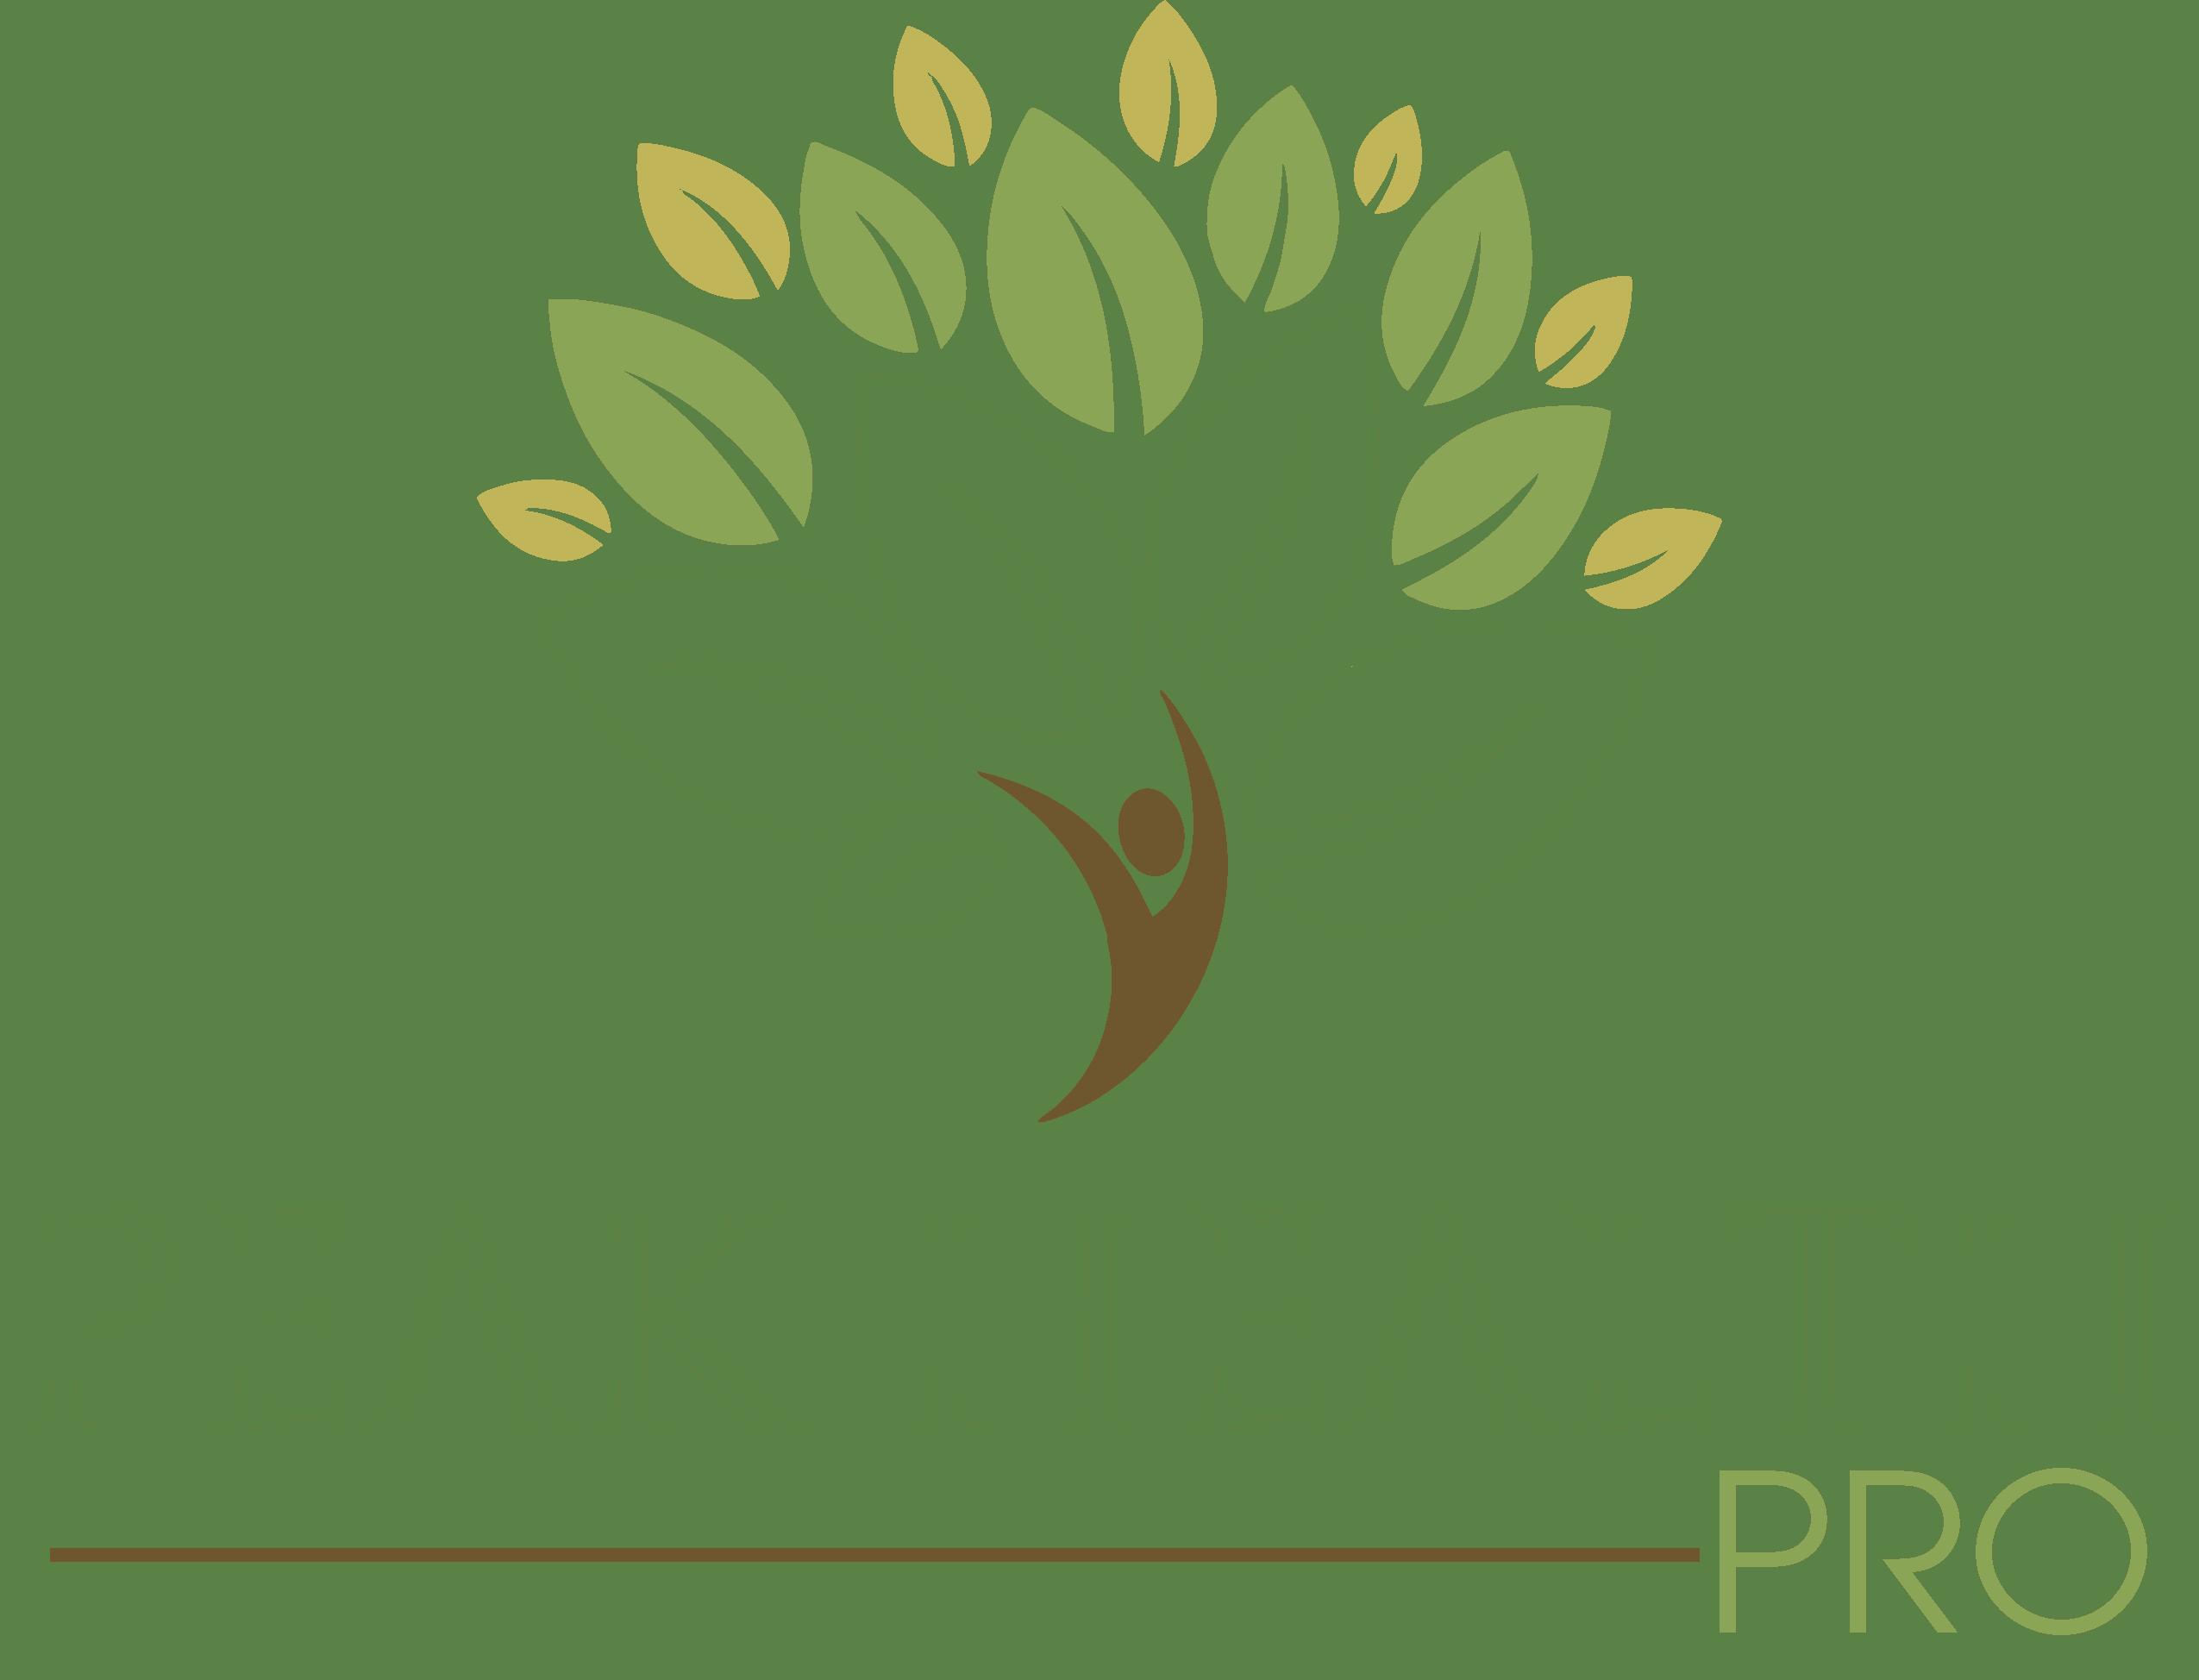 peak health pro